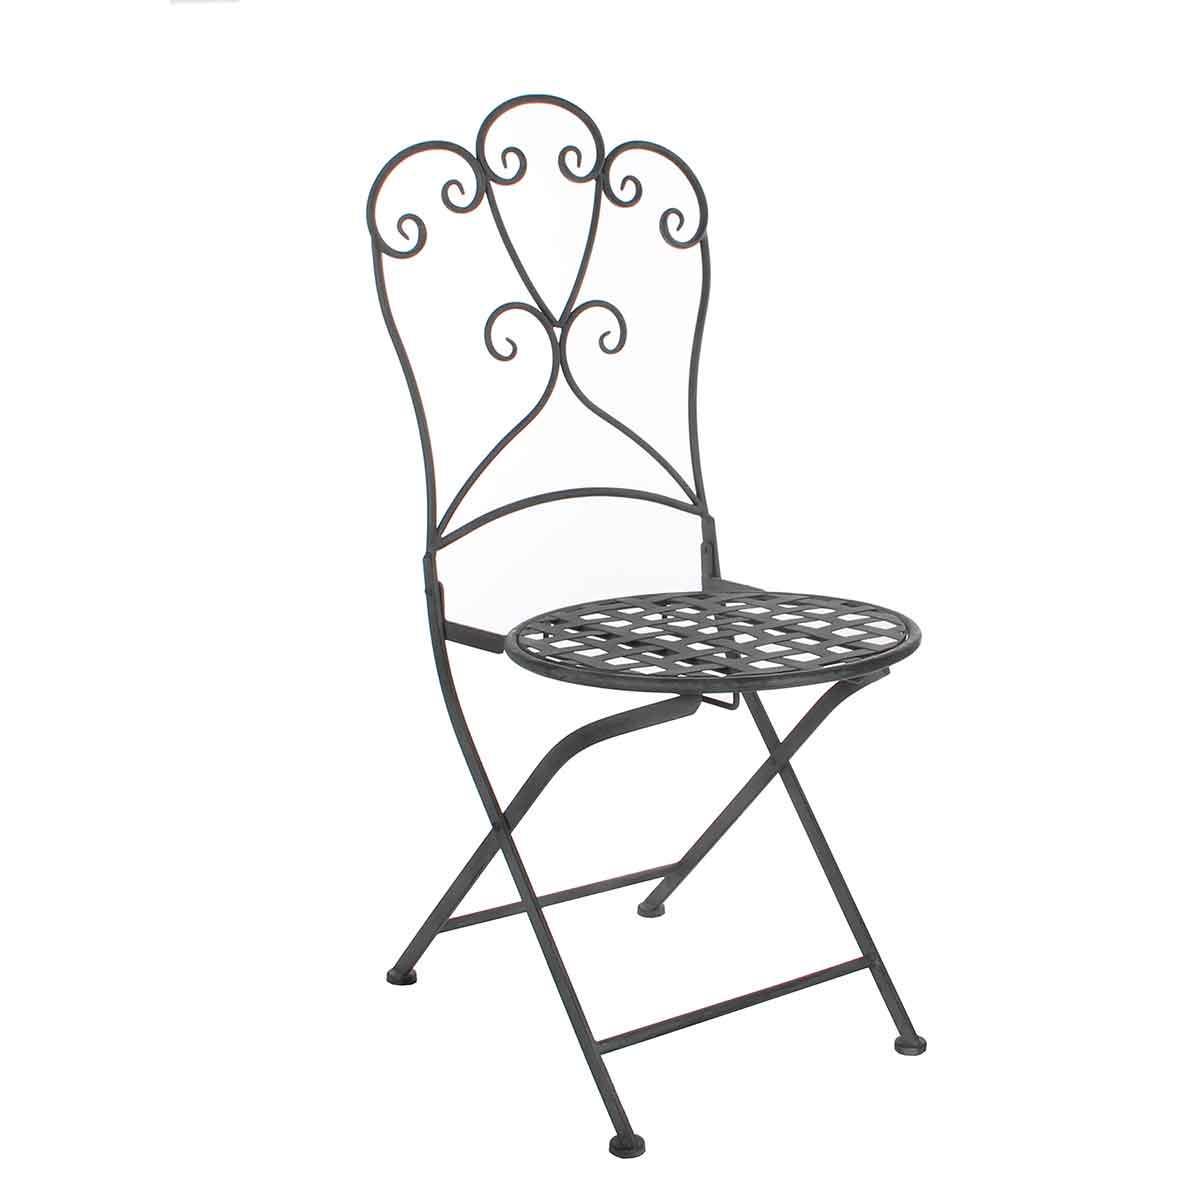 FonQ-Greenware stoel sara maat in cm: 39 x 39 x 92.5 grijs-aanbieding